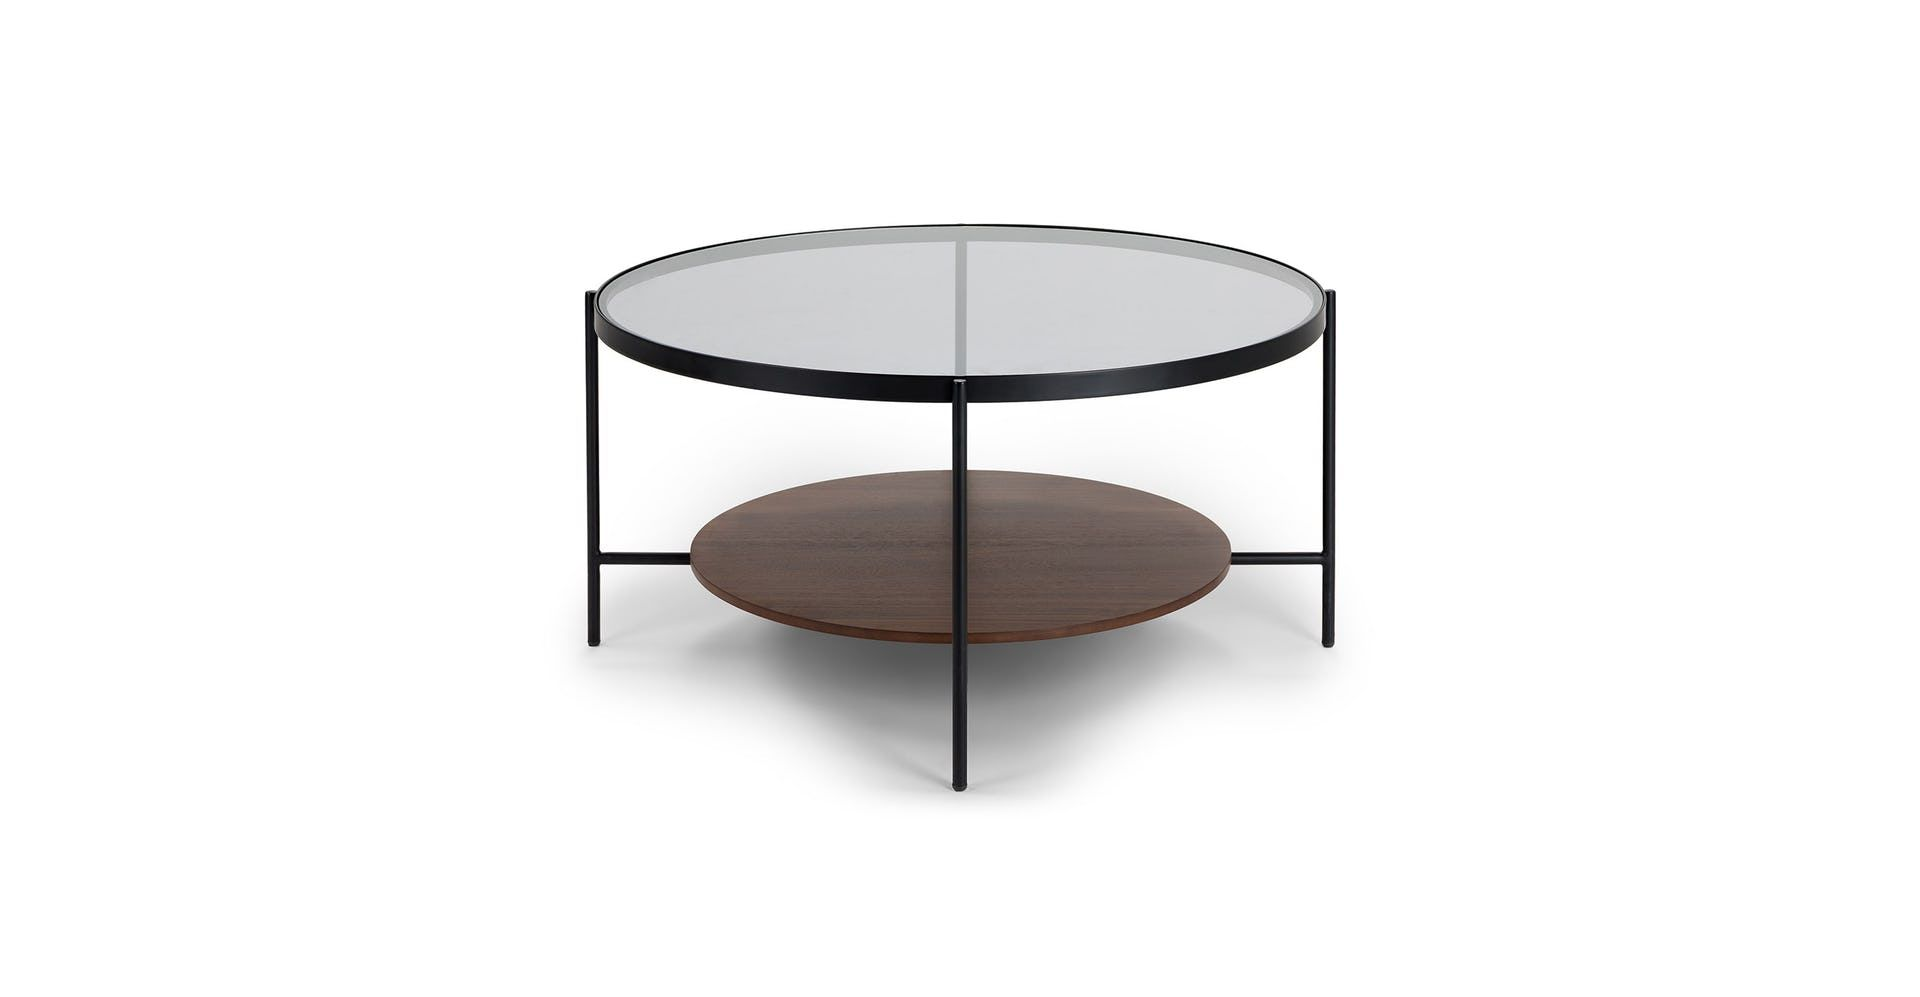 Vitri Walnut Coffee Table Walnut Coffee Table Mirrored Coffee Tables Metal Coffee Table [ 997 x 1920 Pixel ]